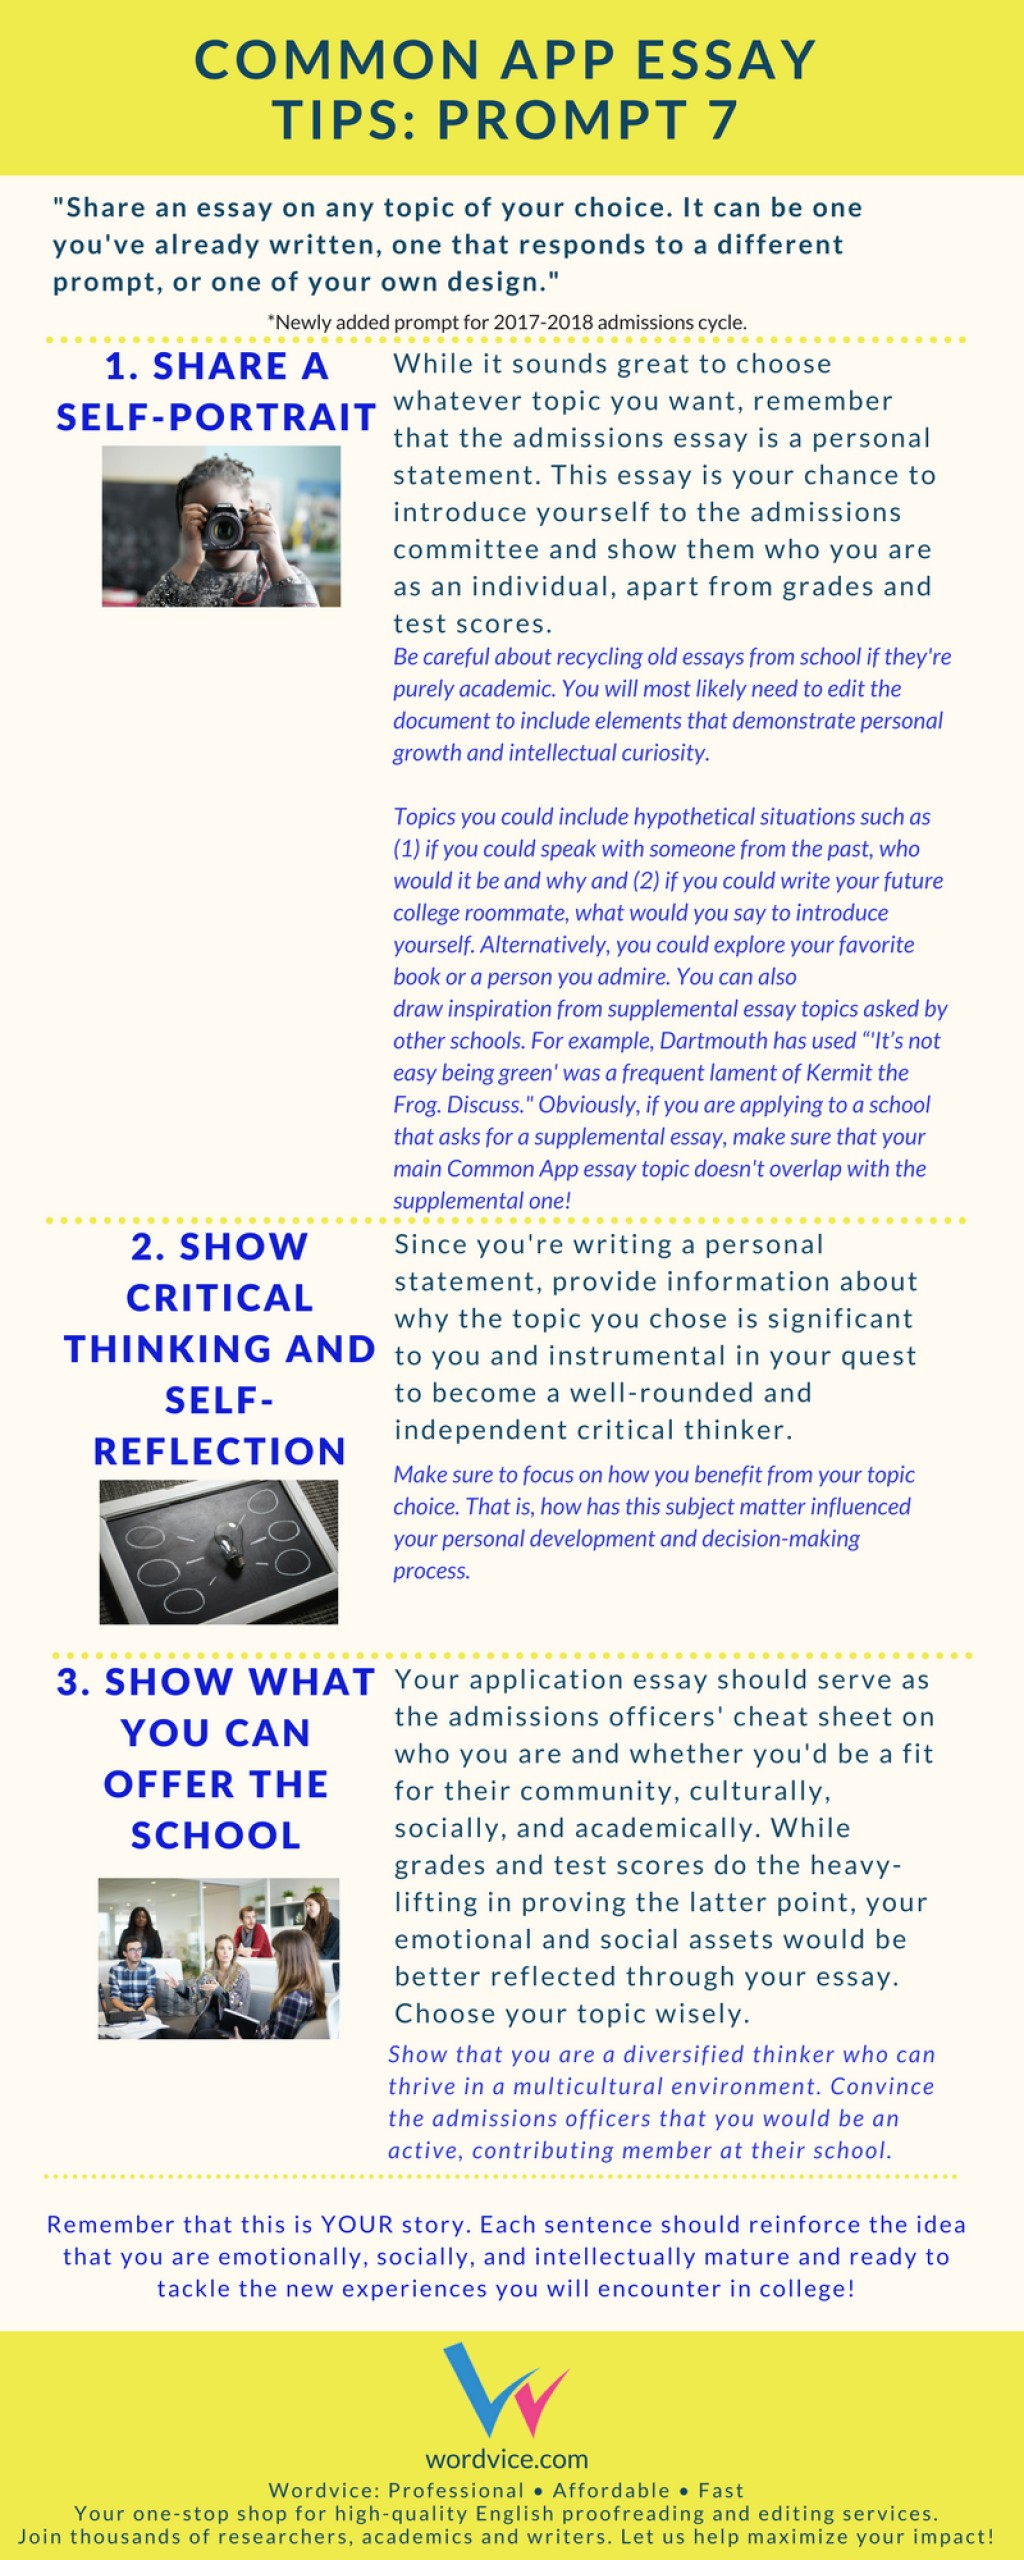 008 Common App Brainstormprompt Essay Example Unusual Prompt Prompts Usc Examples 1 4 Large